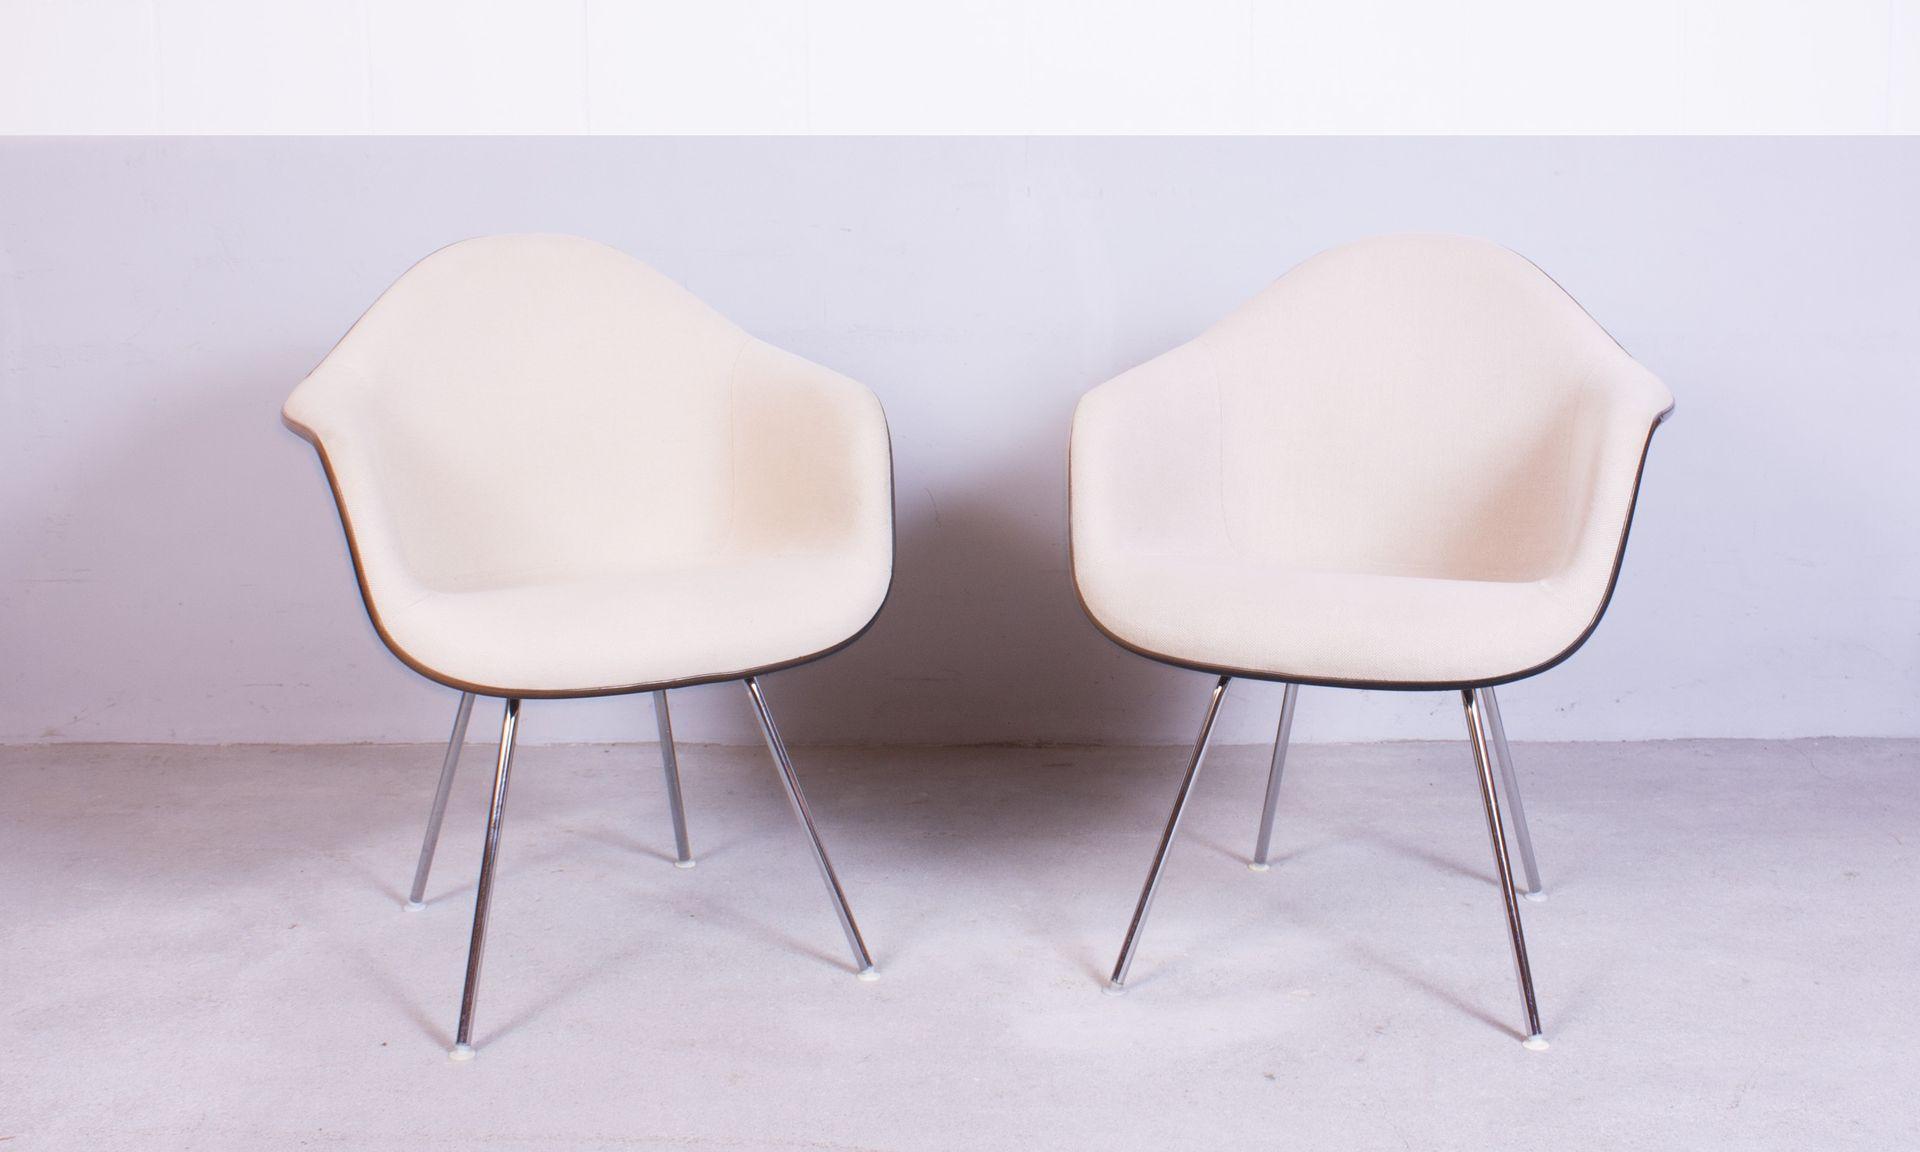 modell dax stuhl von charles ray eames f r herman miller. Black Bedroom Furniture Sets. Home Design Ideas